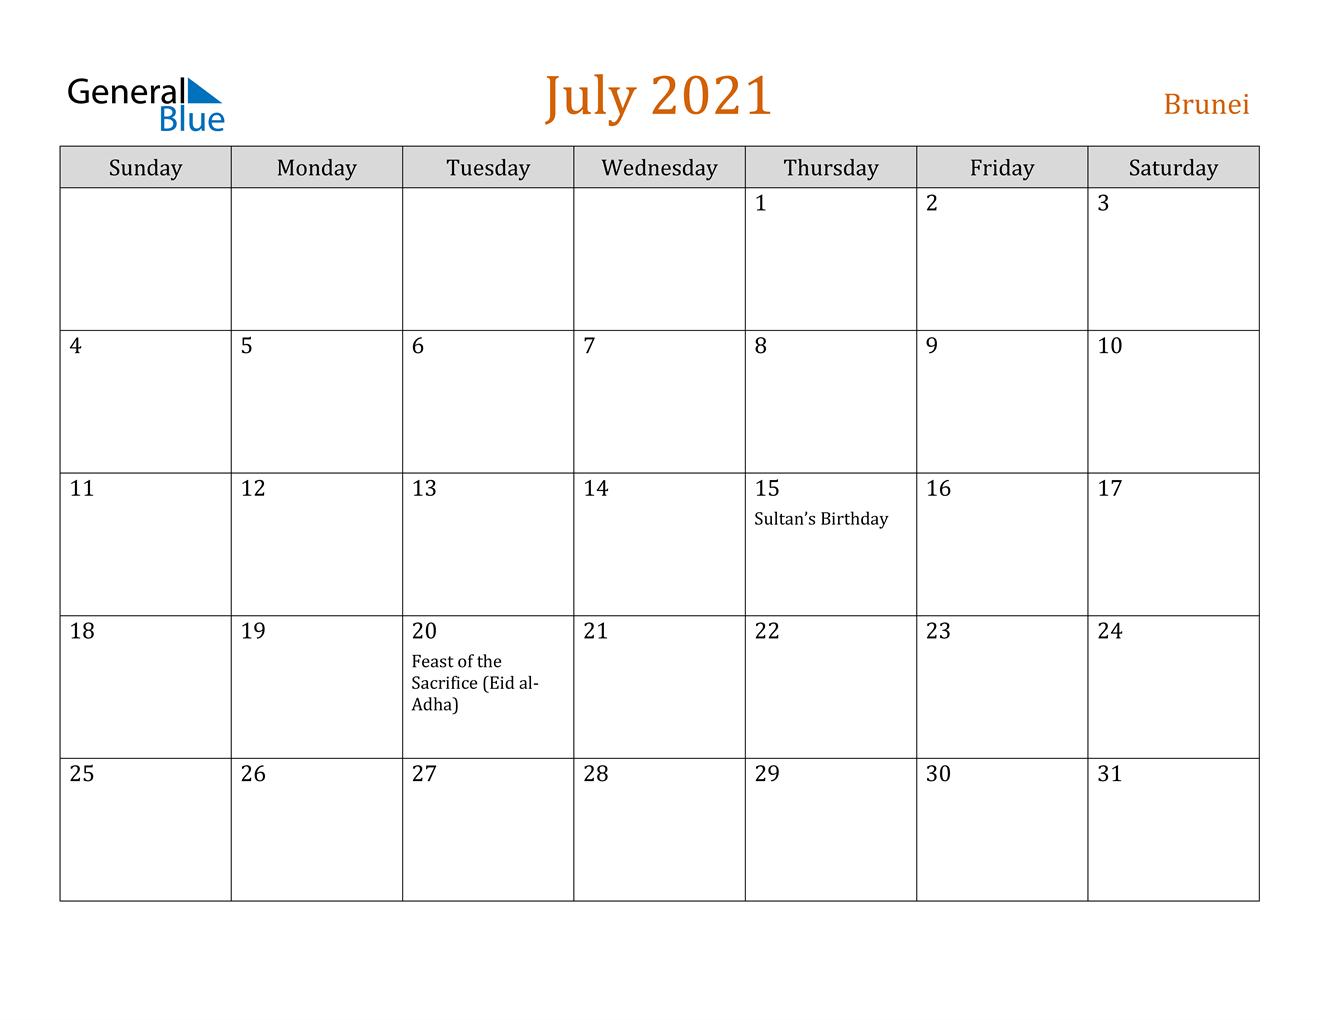 July 2021 Calendar - Brunei  Depoprecara Calendar  July 2021